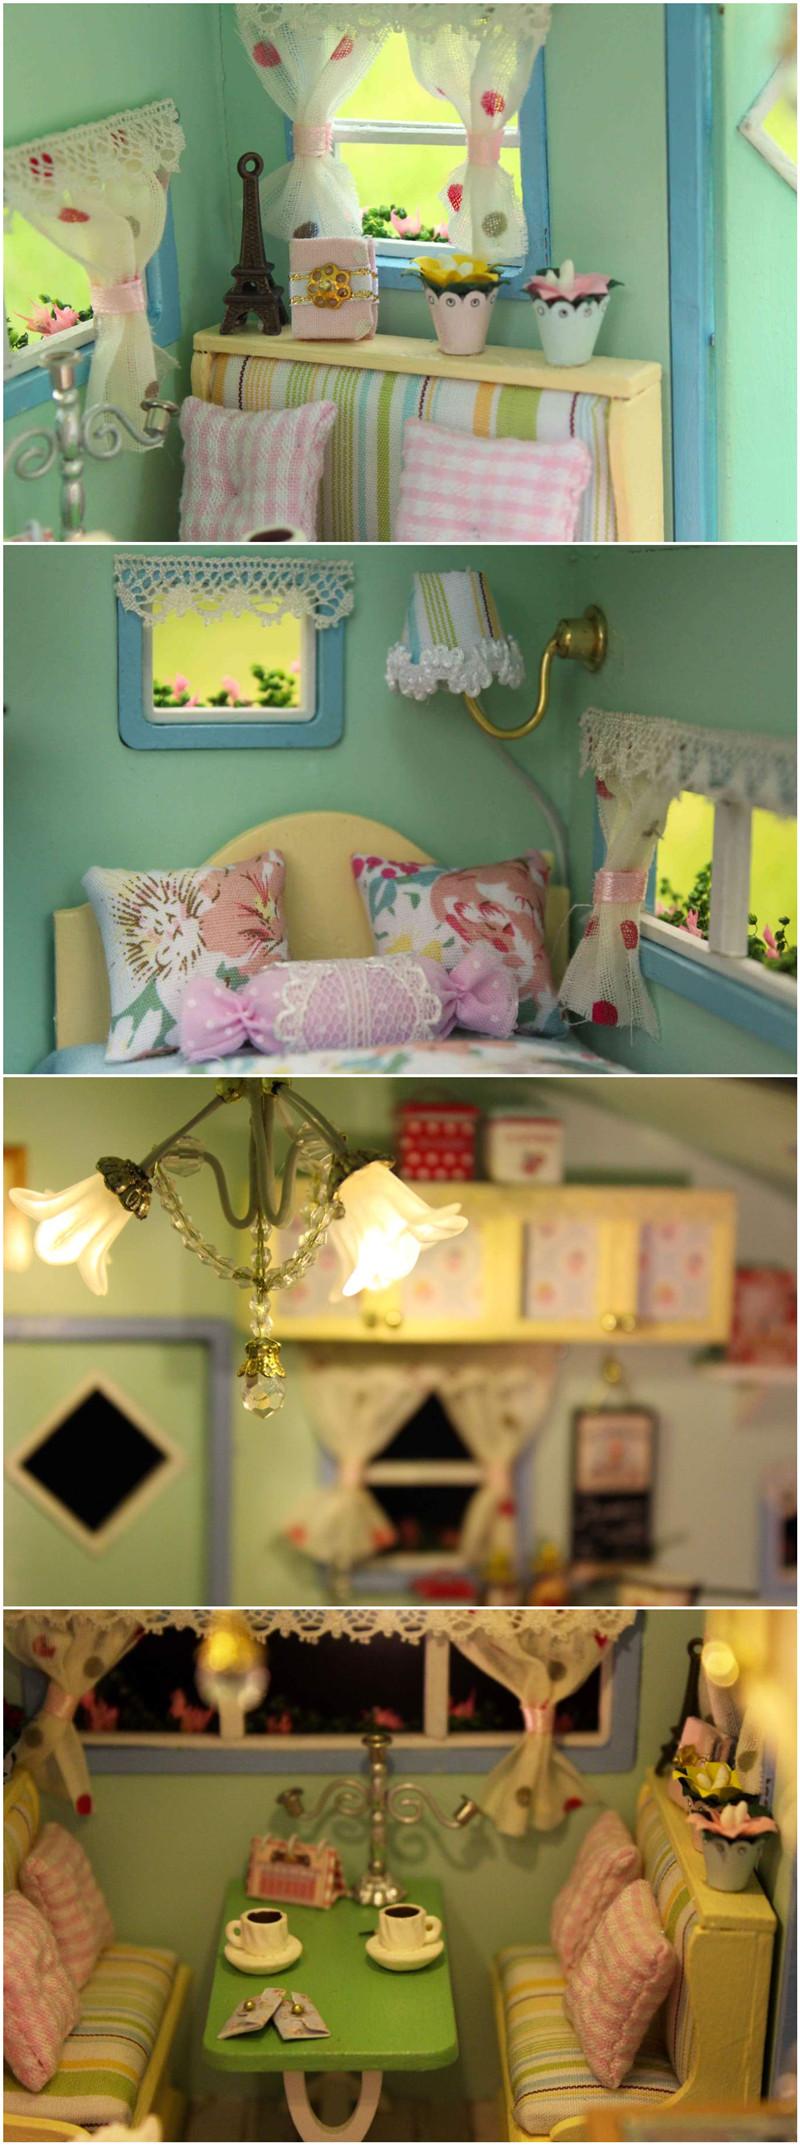 HTB1MEEzN4TpK1RjSZR0q6zEwXXaQ - Robotime - DIY Models, DIY Miniature Houses, 3d Wooden Puzzle